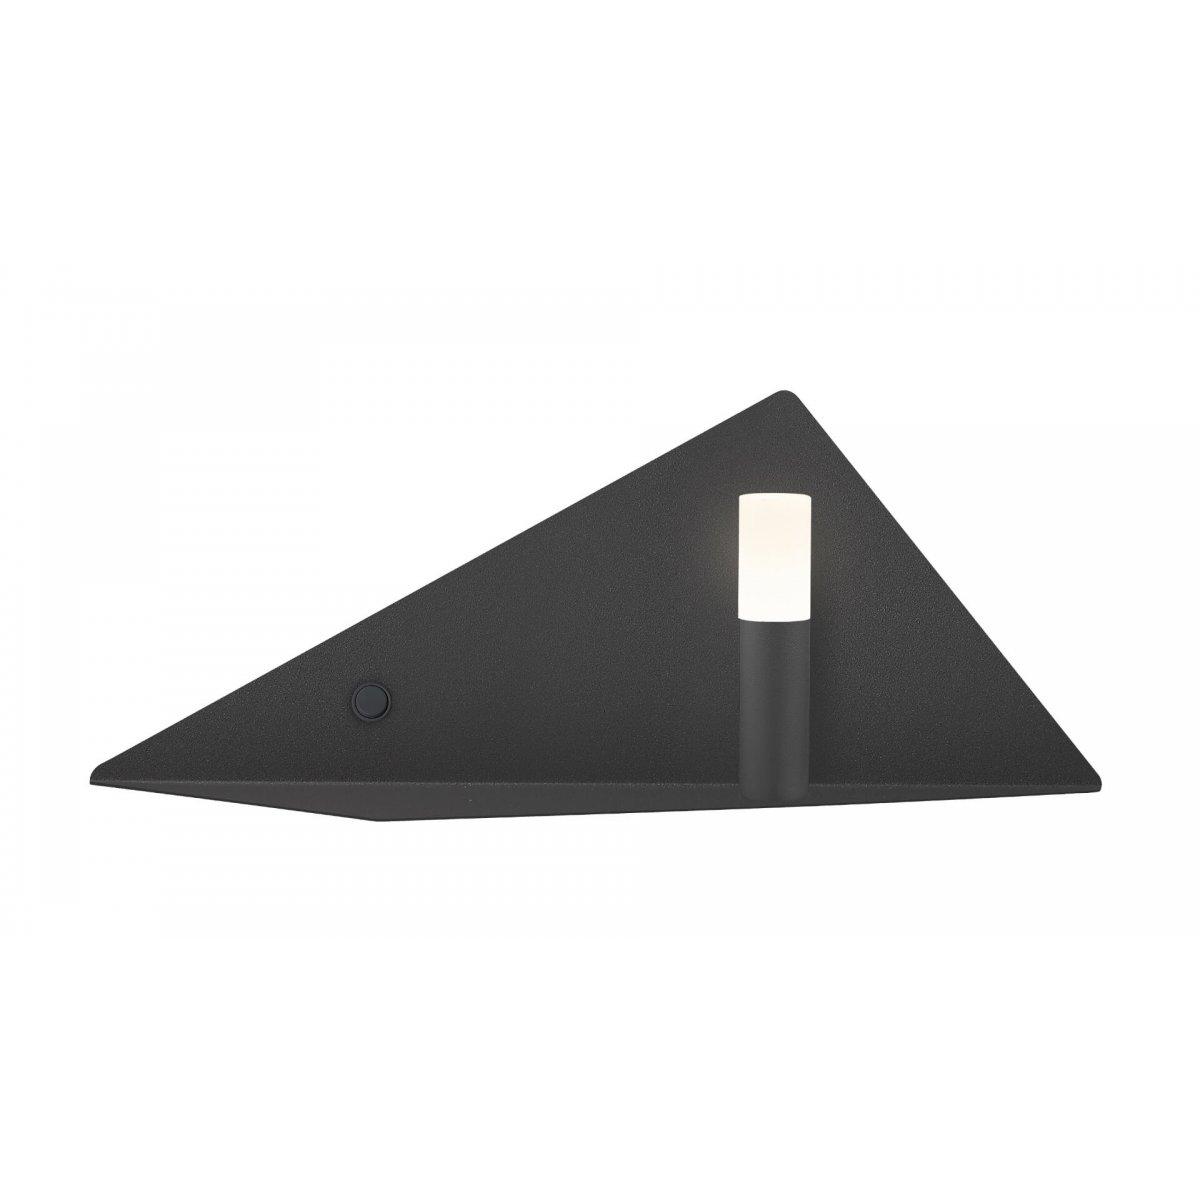 Aplică interior LED TRIGON AP1 negru mat - Unique by Klausen